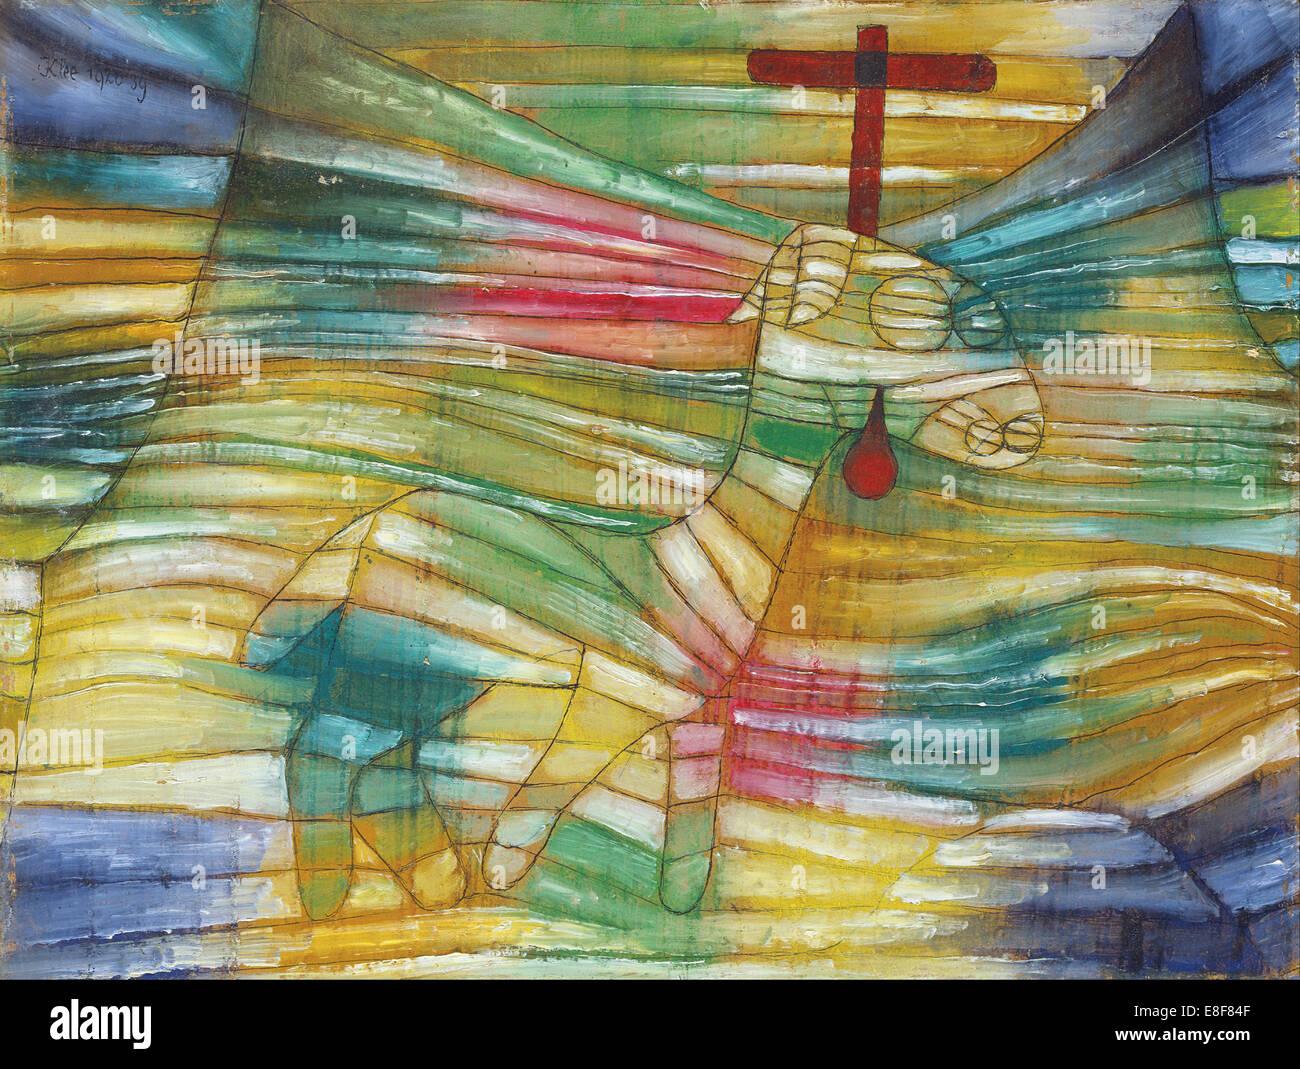 The Lamb. Artist: Klee, Paul (1879-1940) - Stock Image